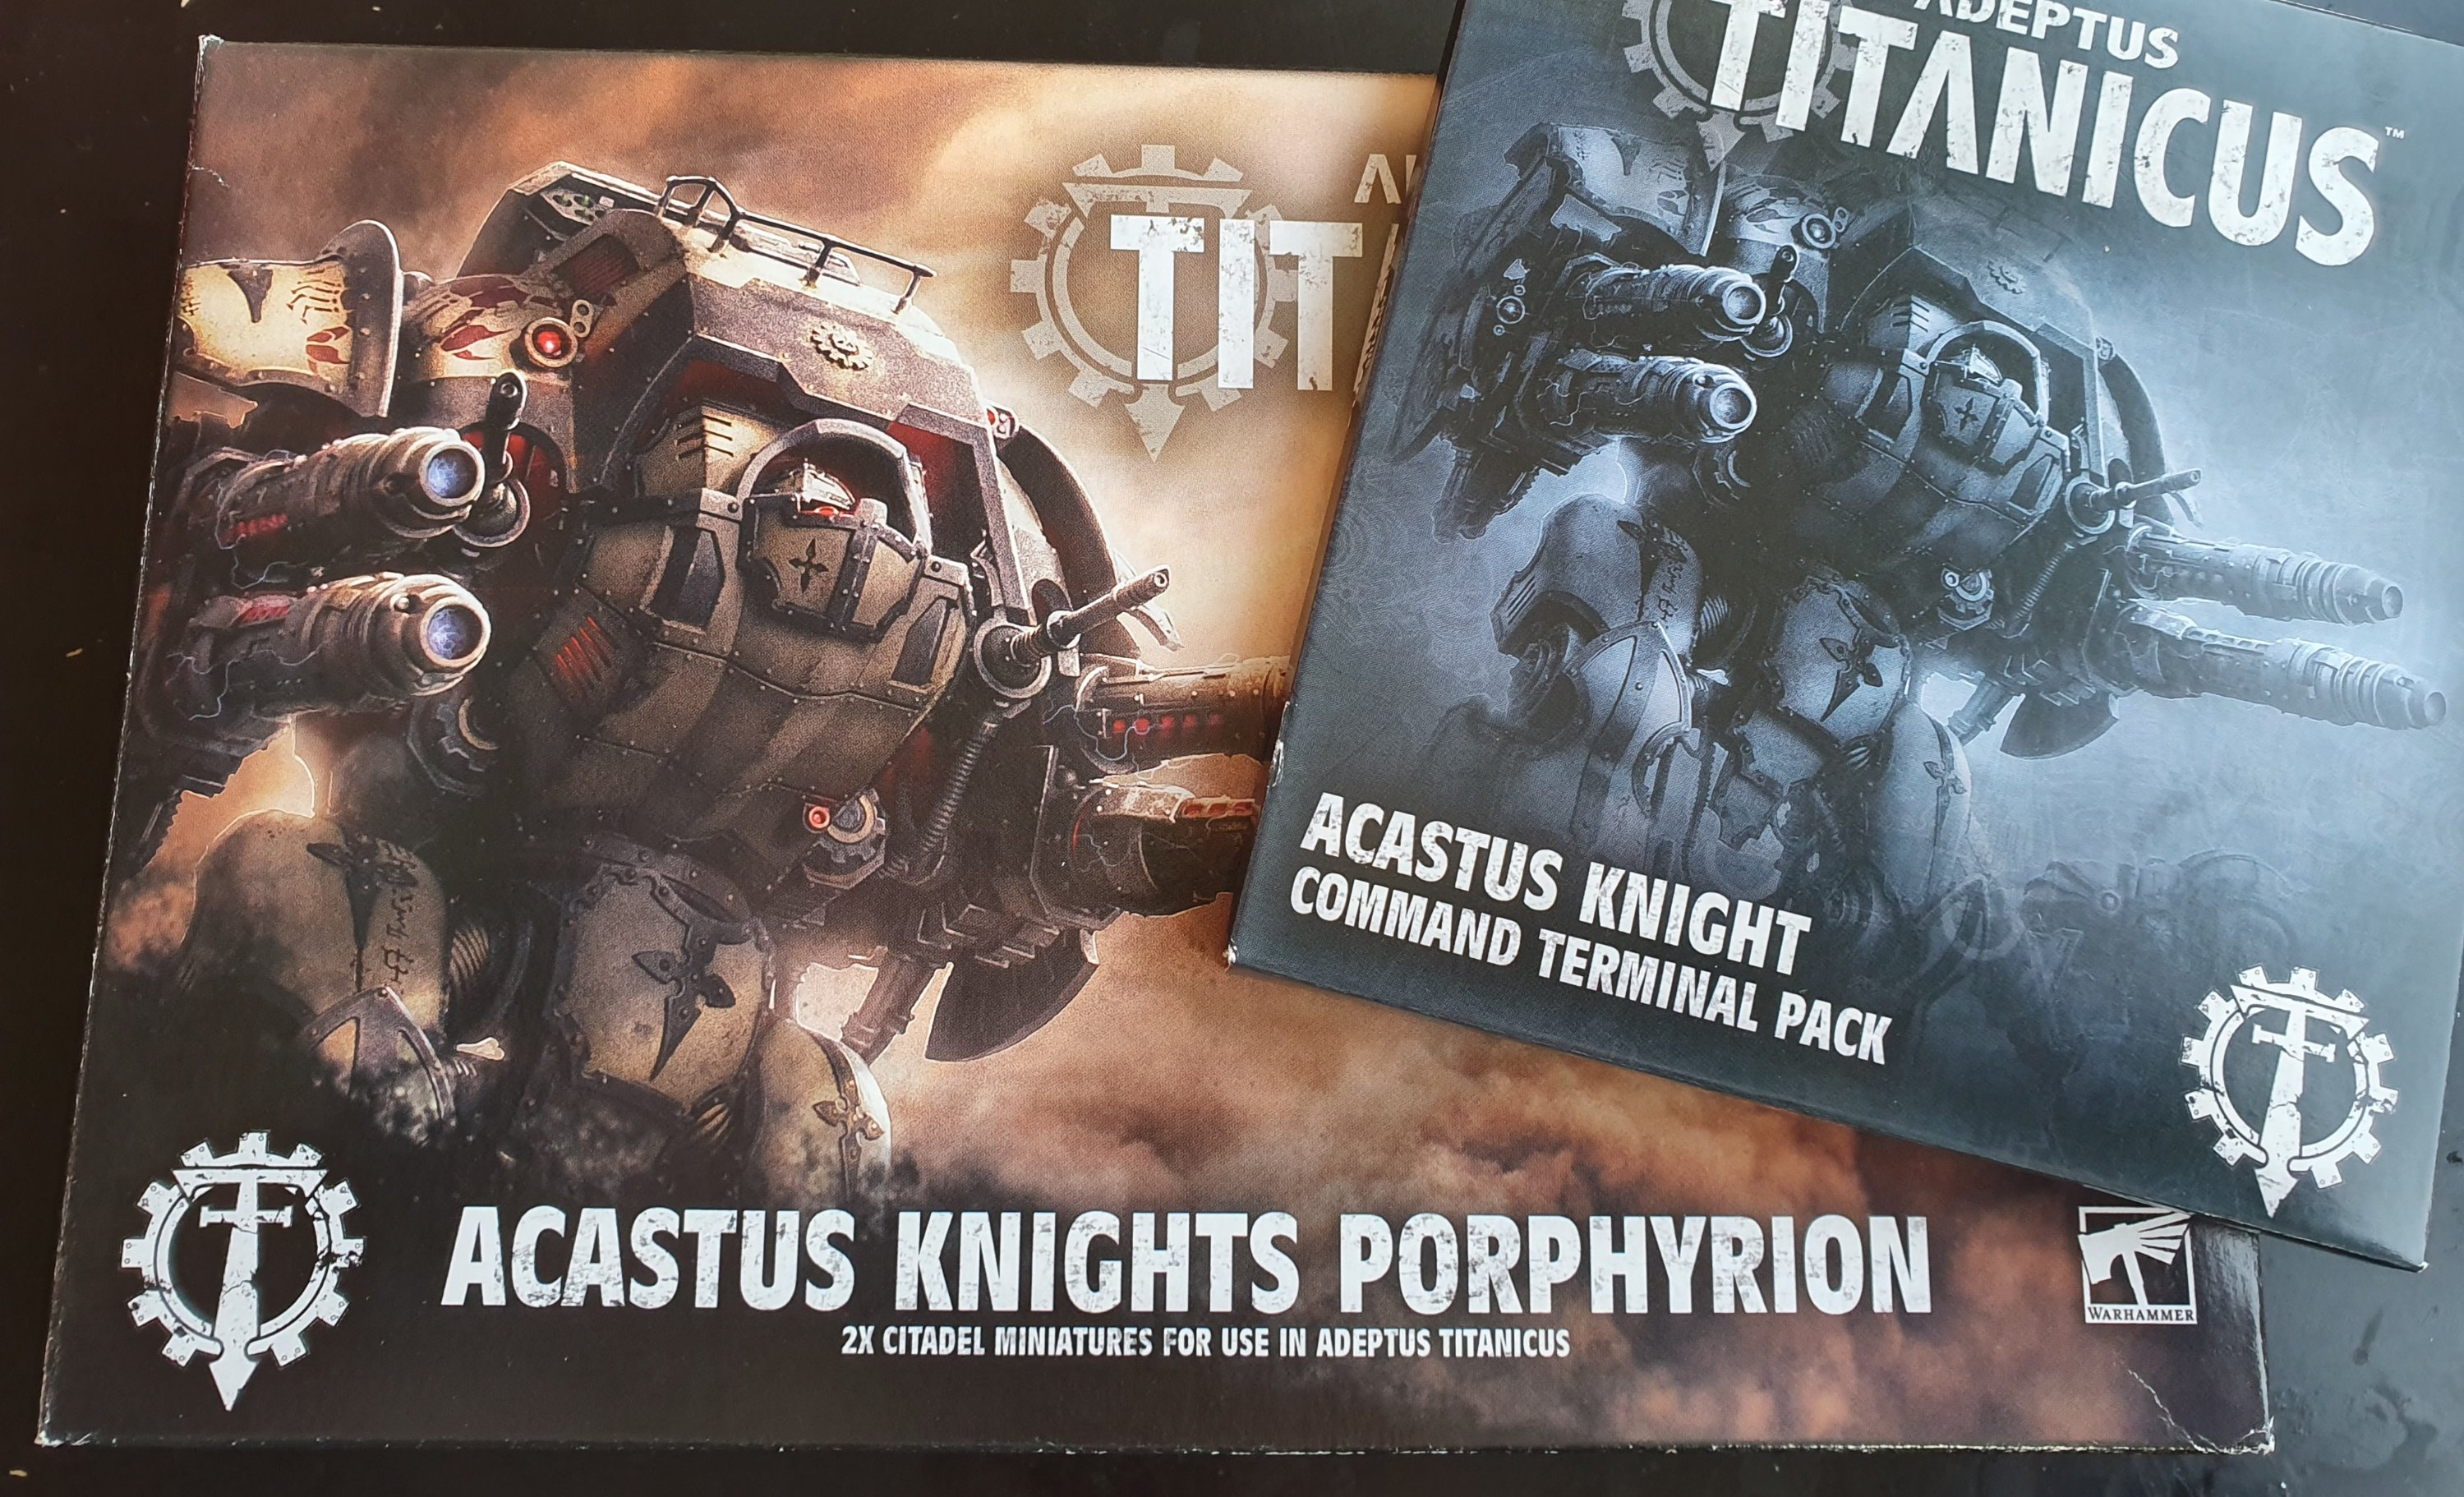 Adeptus Titanicus Acastus Knight Porphyrion – Review – The